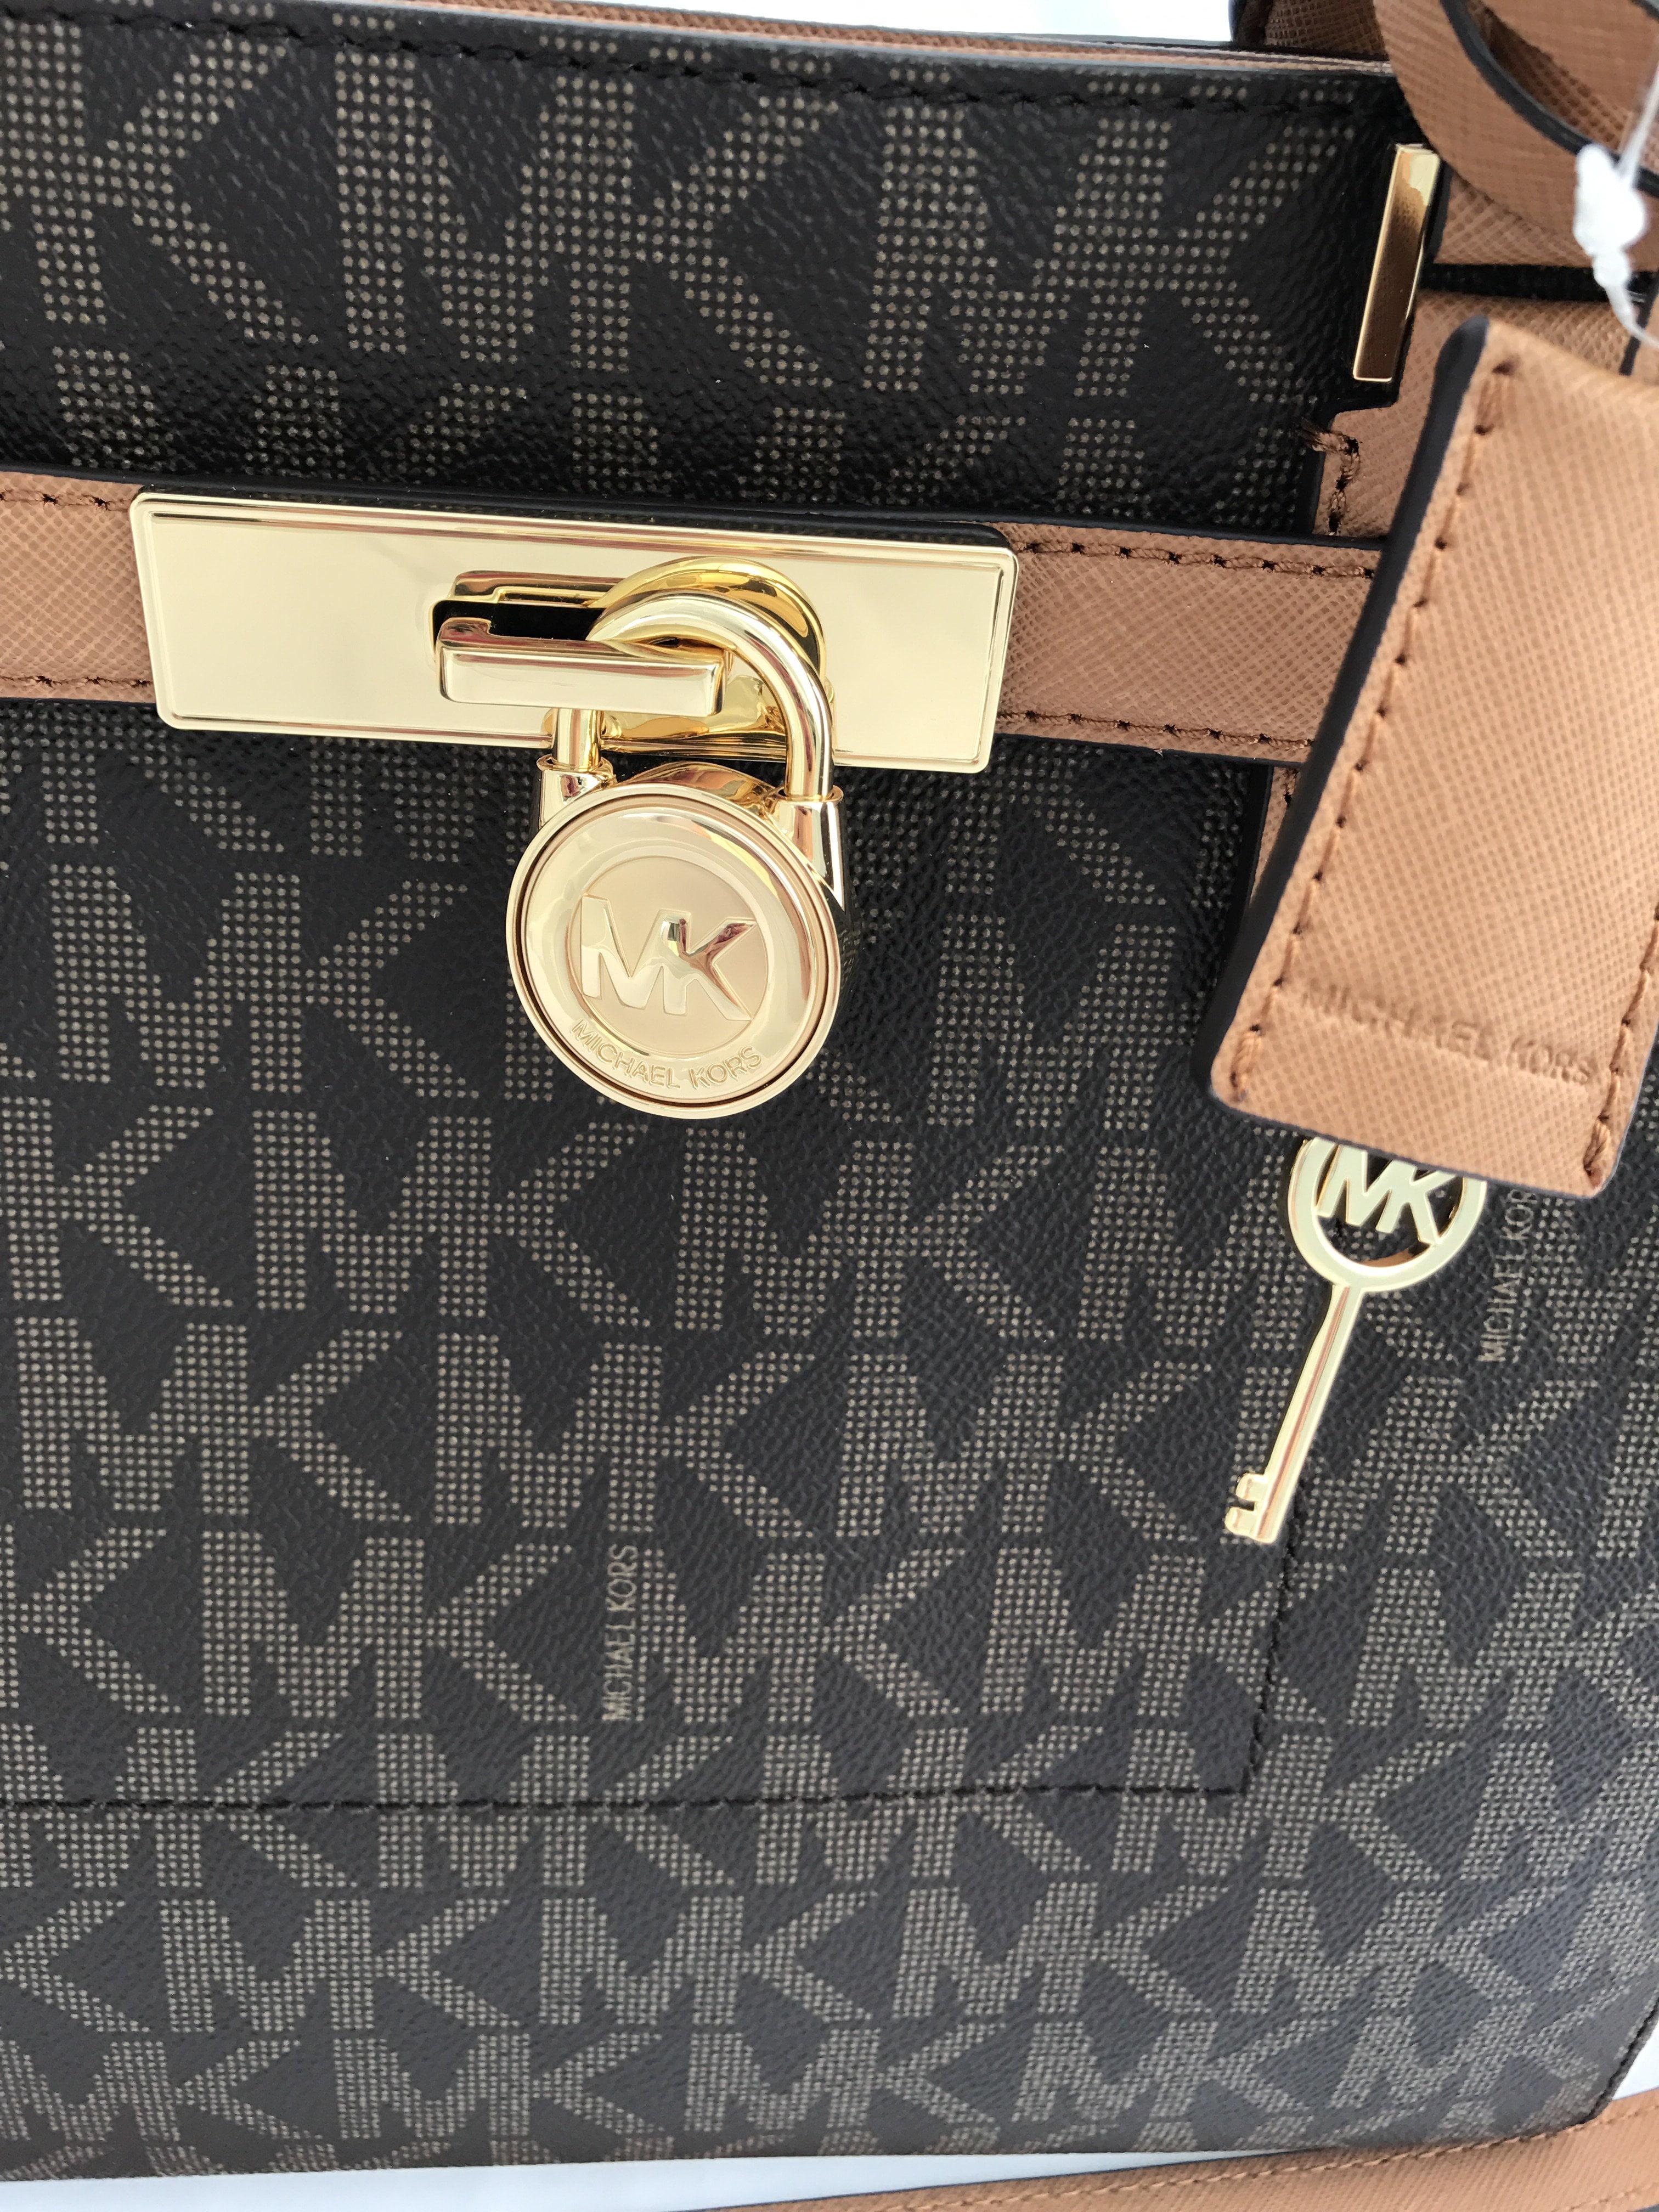 eeba86912e11 Michael Kors - Michael Kors Hamilton Traveler Large Satchel Top Zip Tote  Brown Signature Acorn - Walmart.com